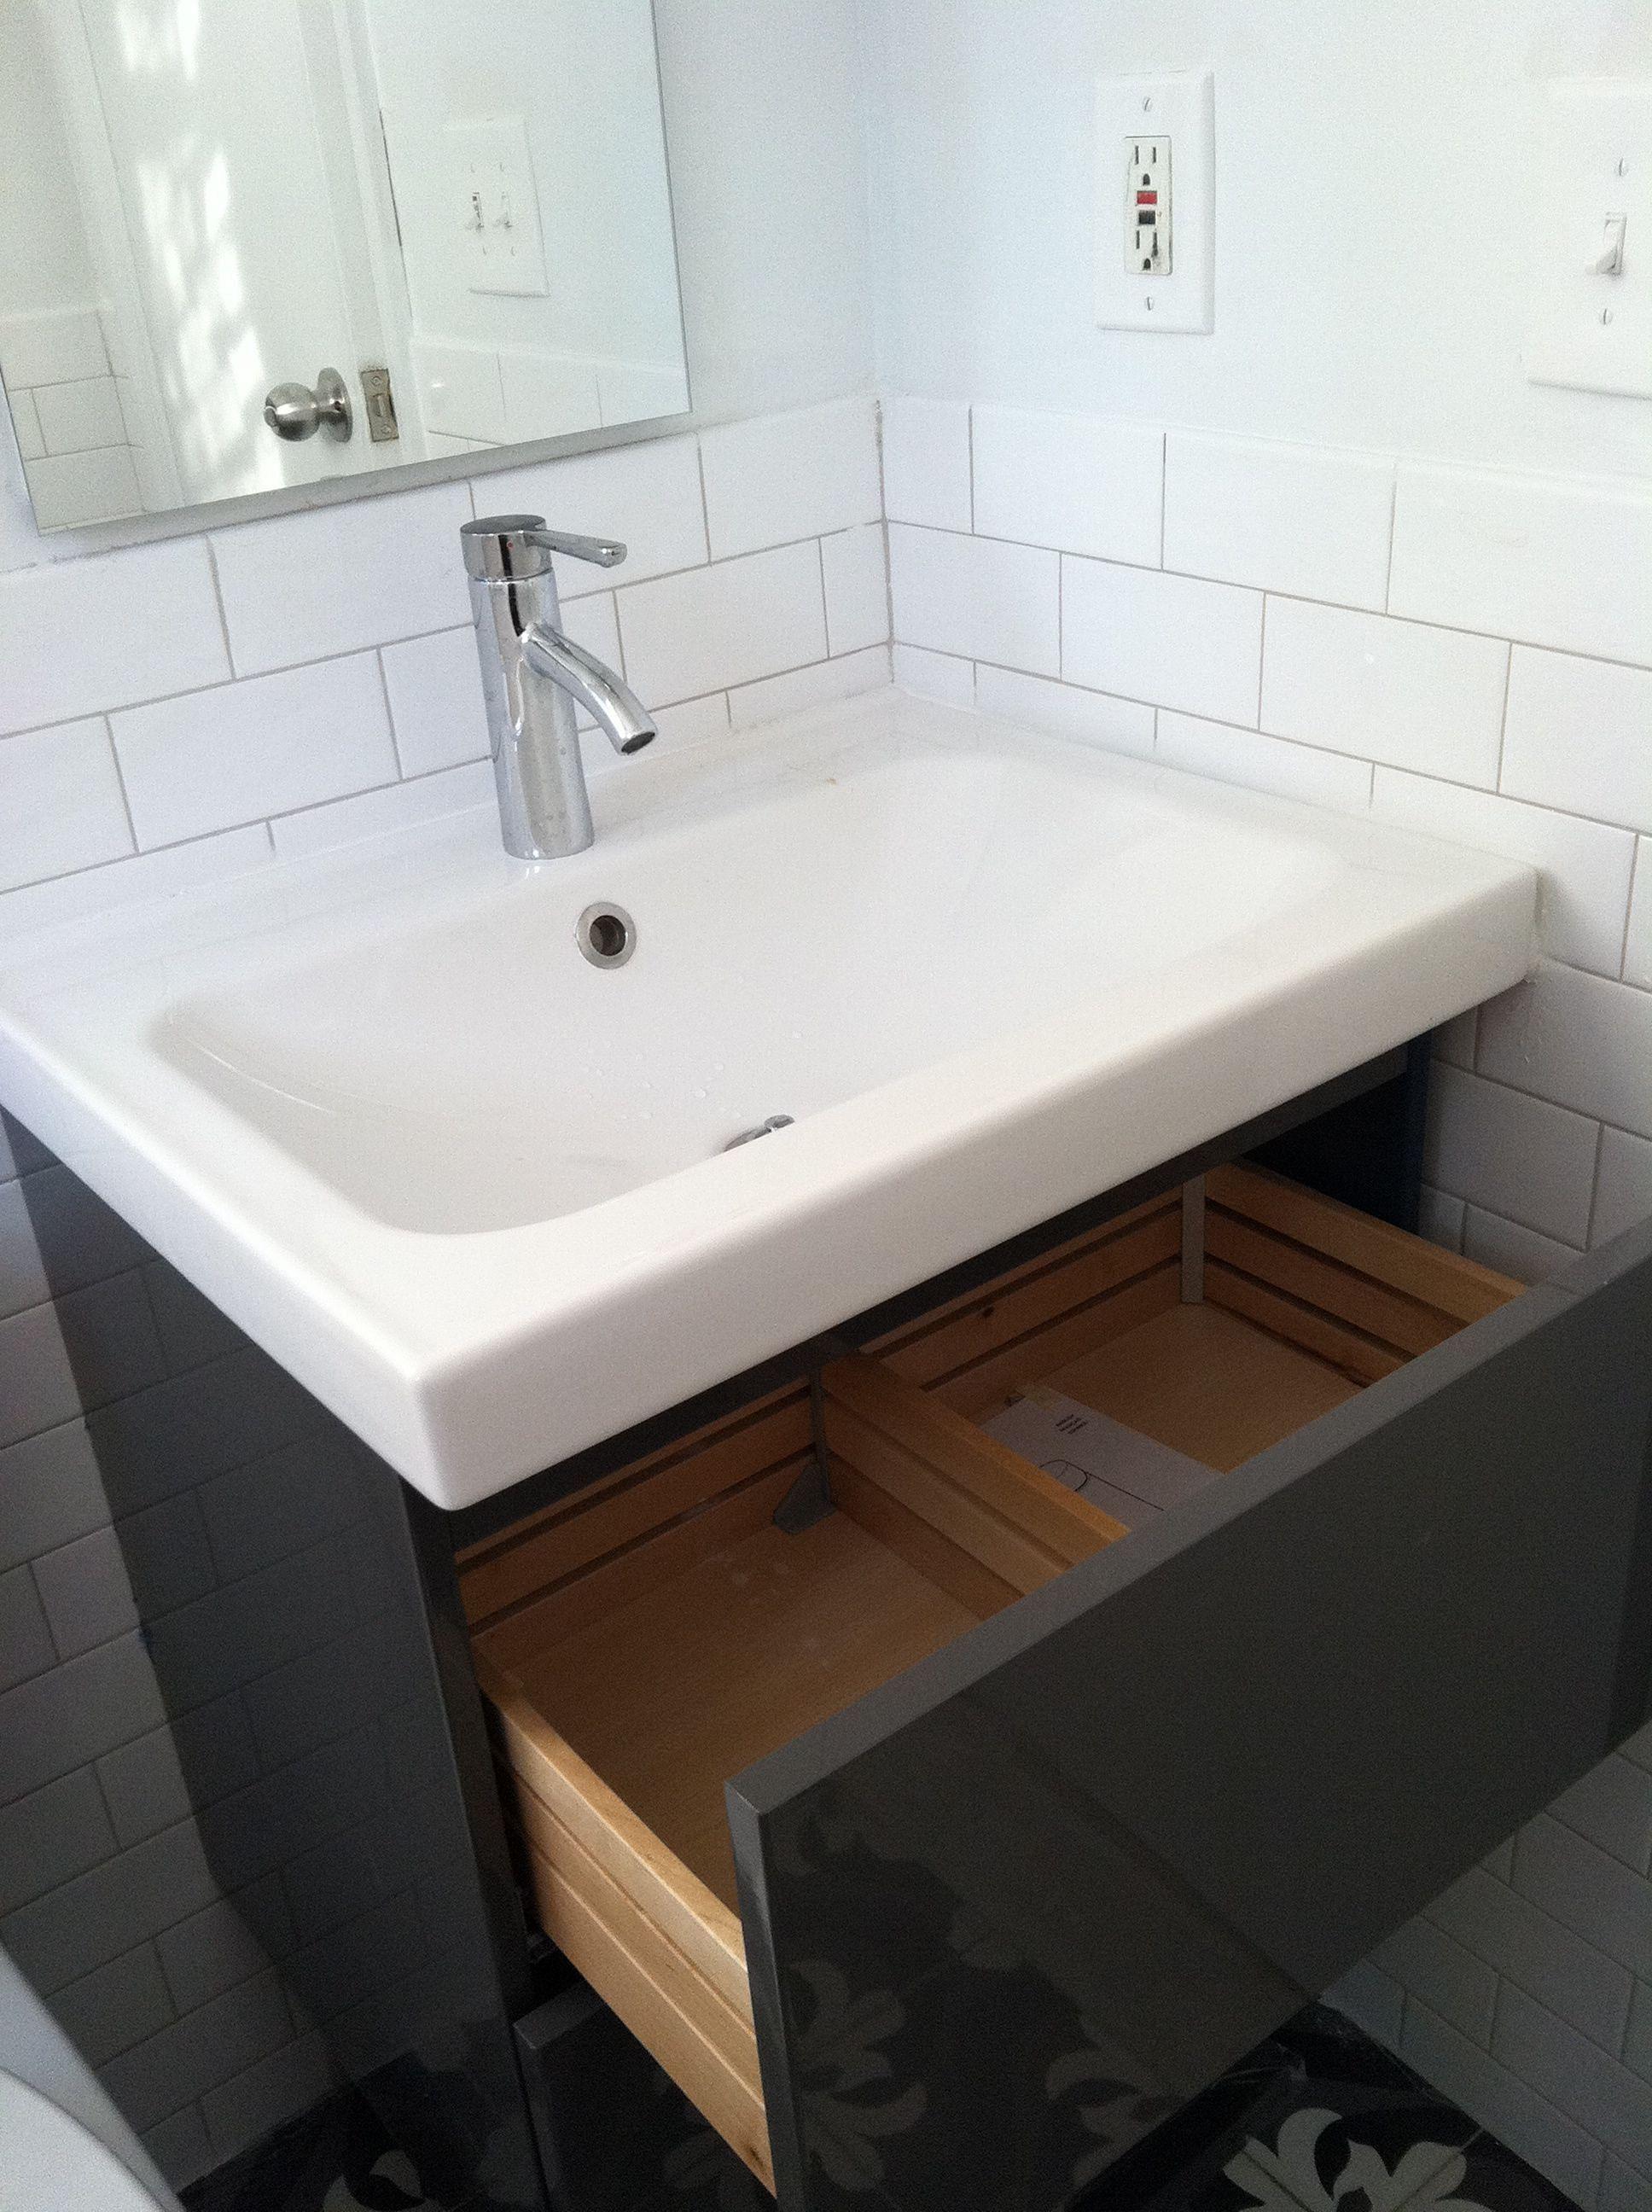 25 Ikea Bathroom Vanities With Tops For Amazing Bathroom Ideas